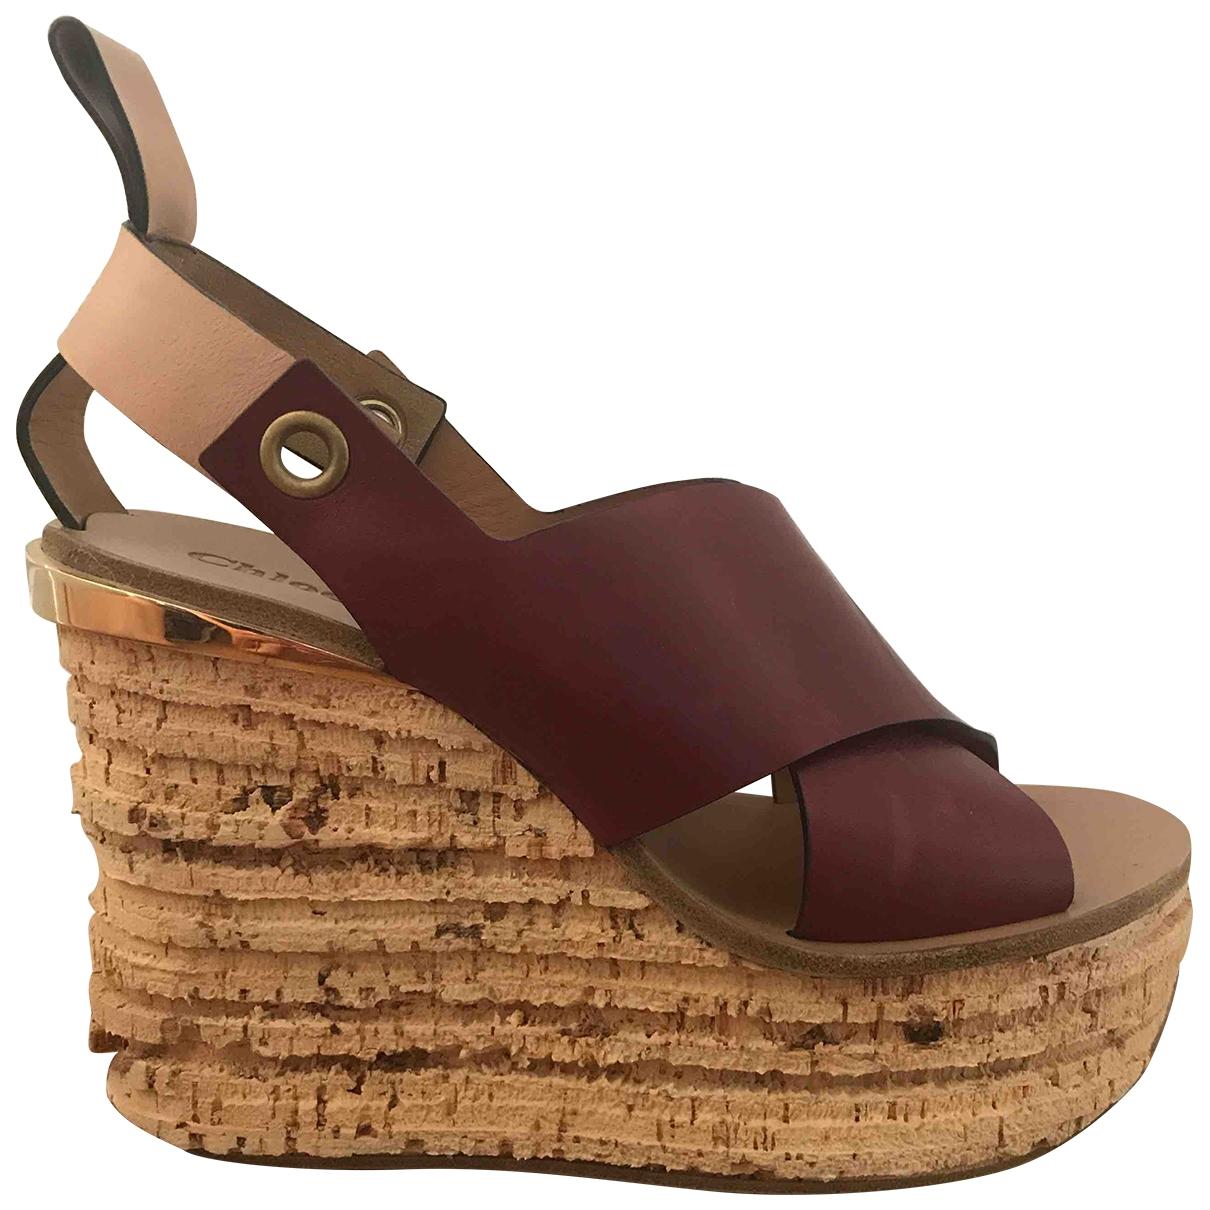 Chloé Camille Burgundy Leather Sandals for Women 39 EU